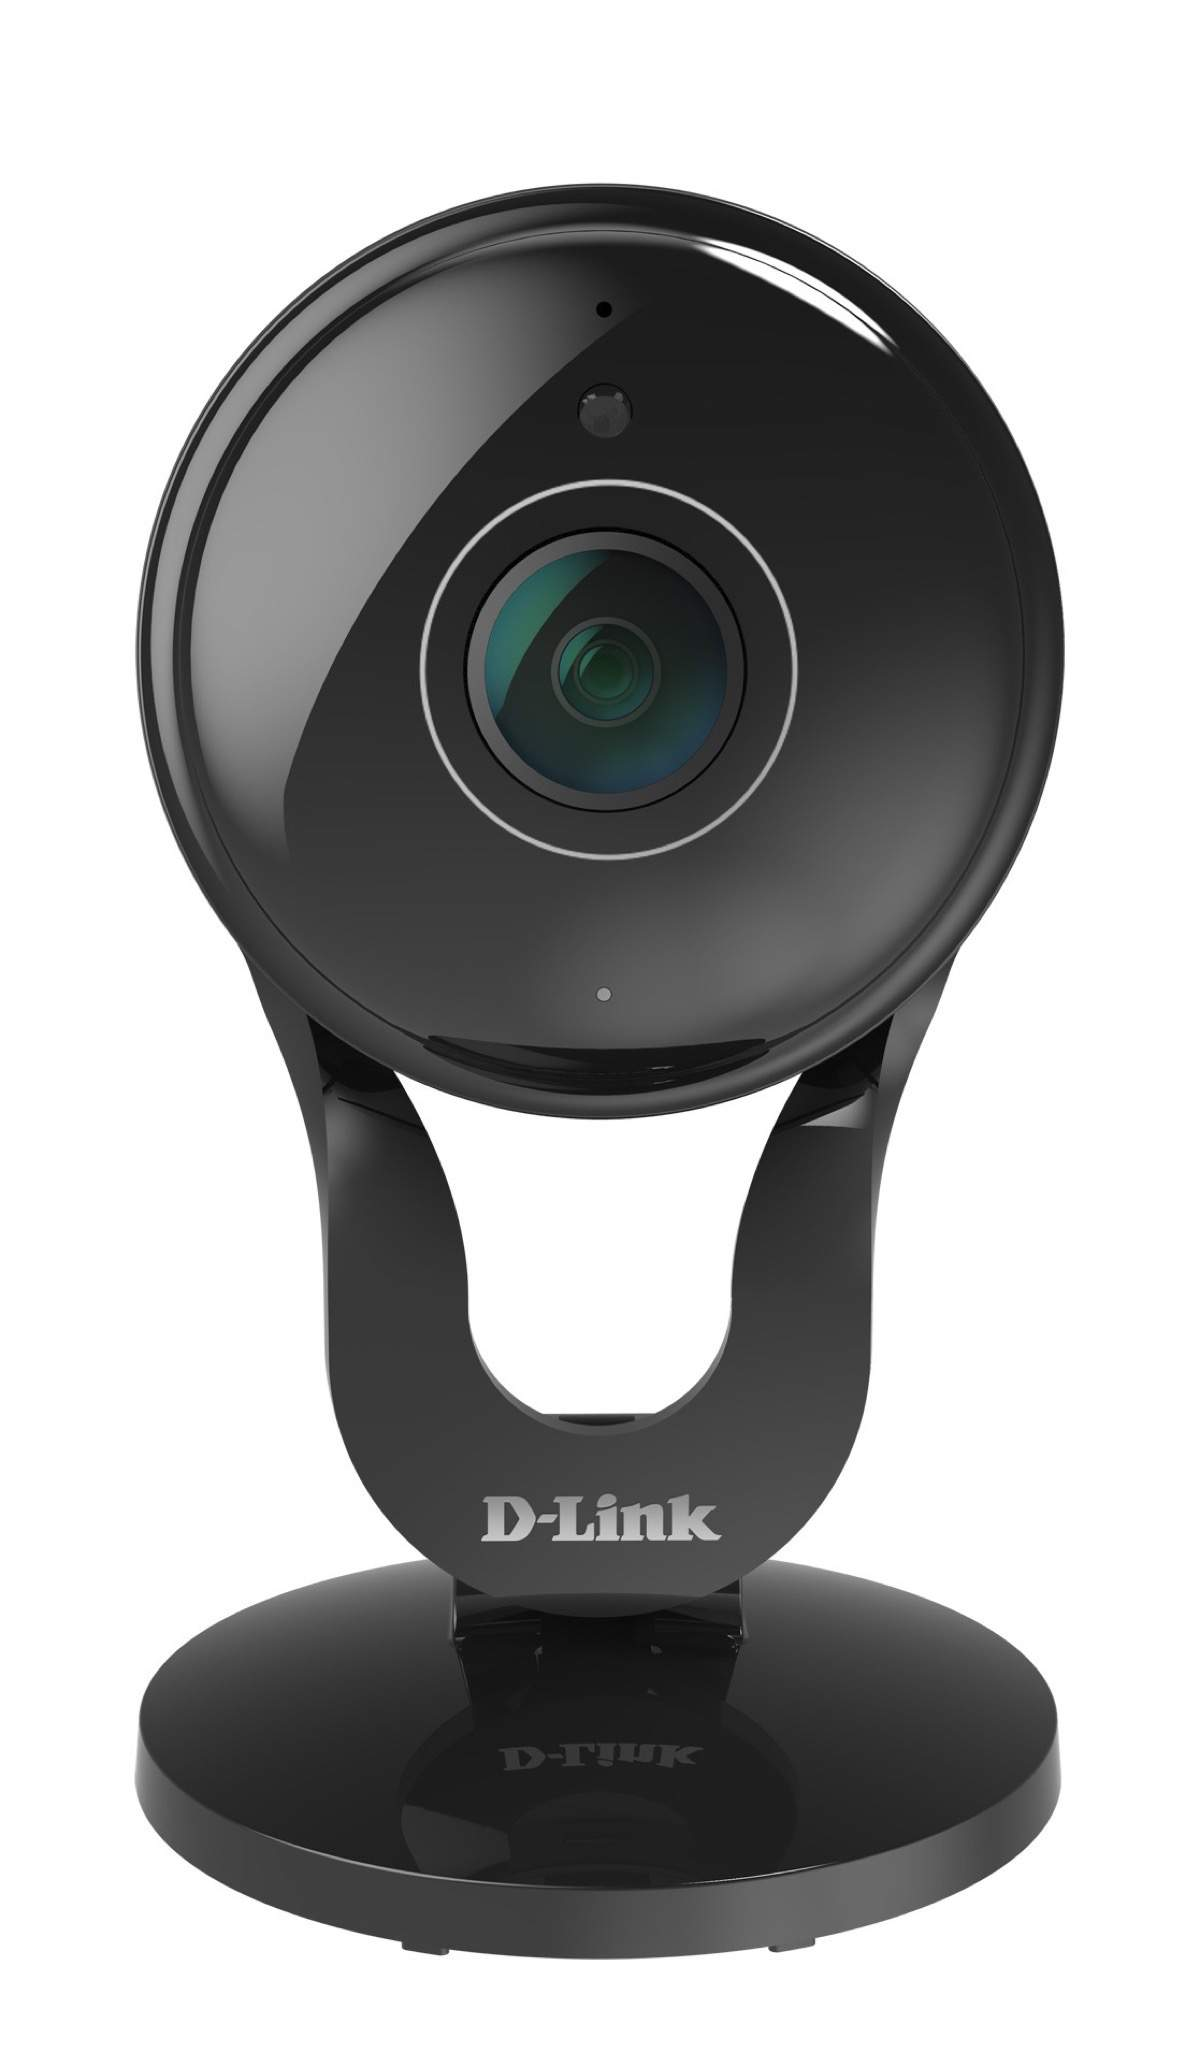 D-Link bringt zur IFA neue IP Kameras - DCS-2530L